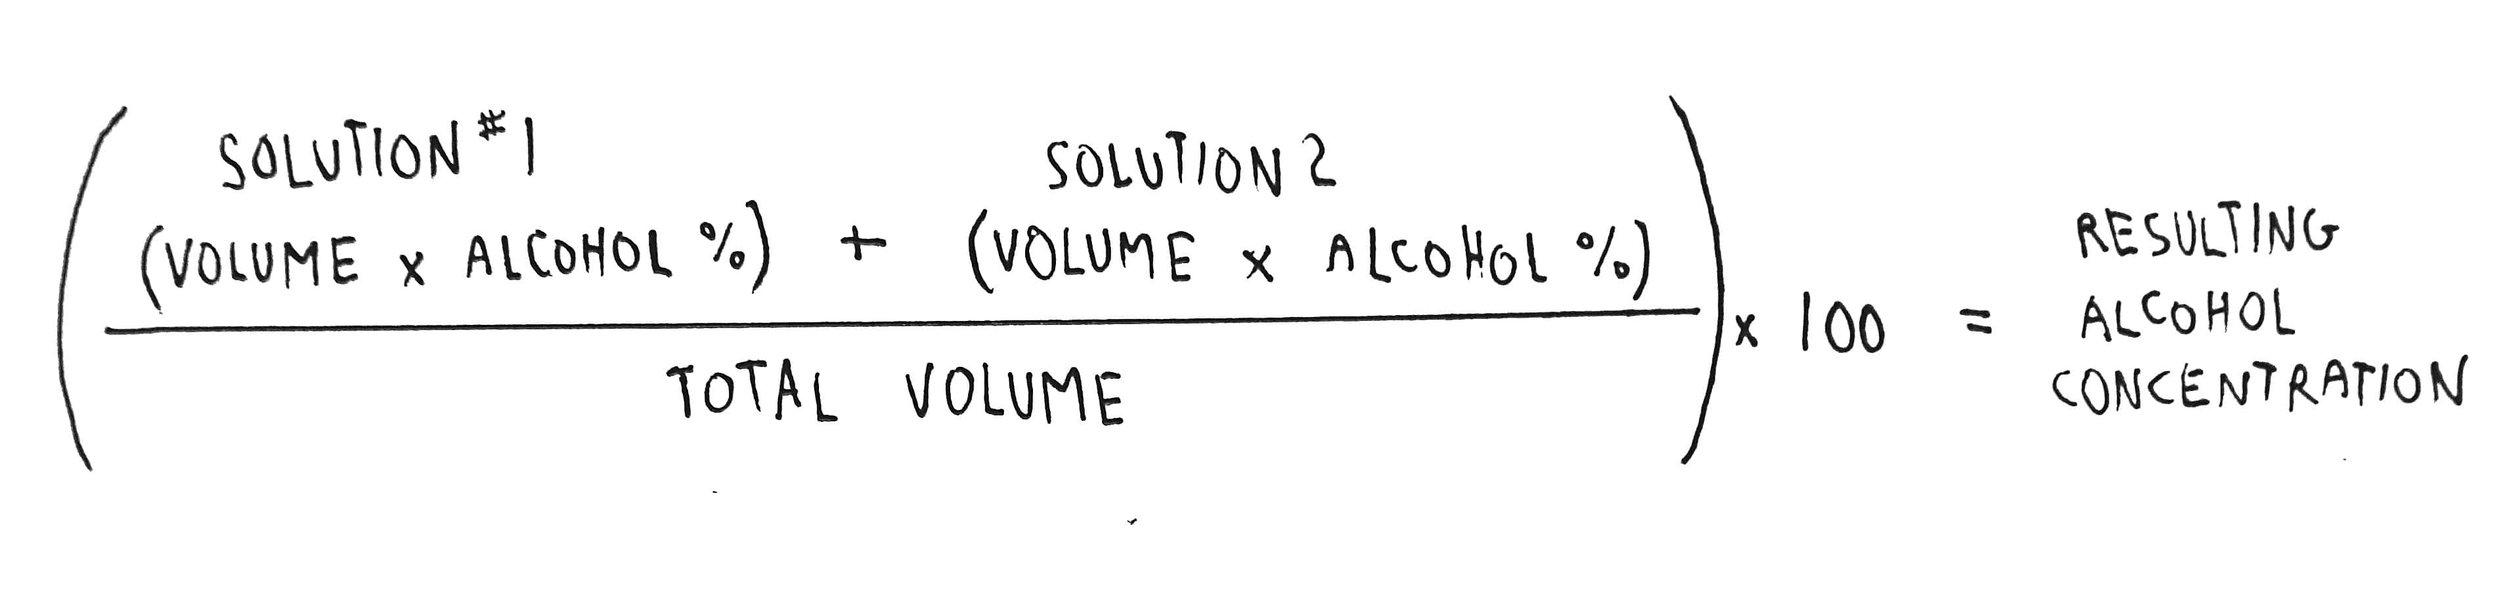 Portland-florist-equation-1jpg